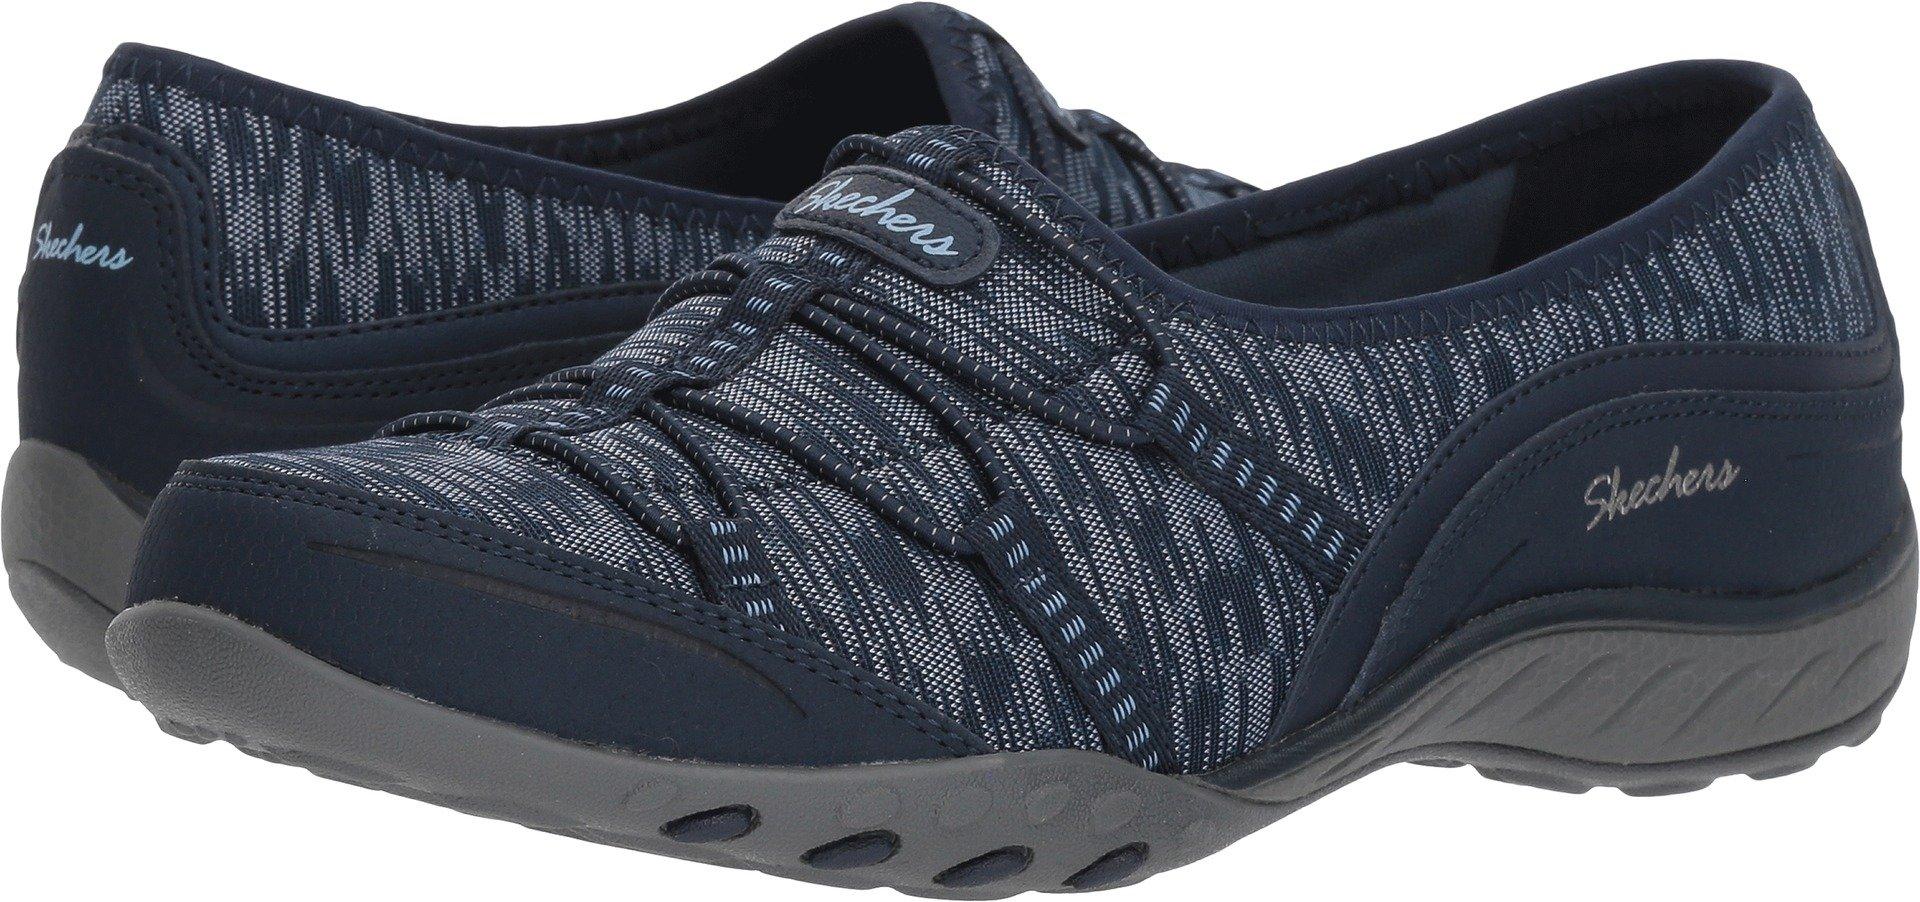 Skechers Womens Relaxed Fit: Breathe Easy Sneaker, Navy, Size 7.5 by Skechers (Image #1)